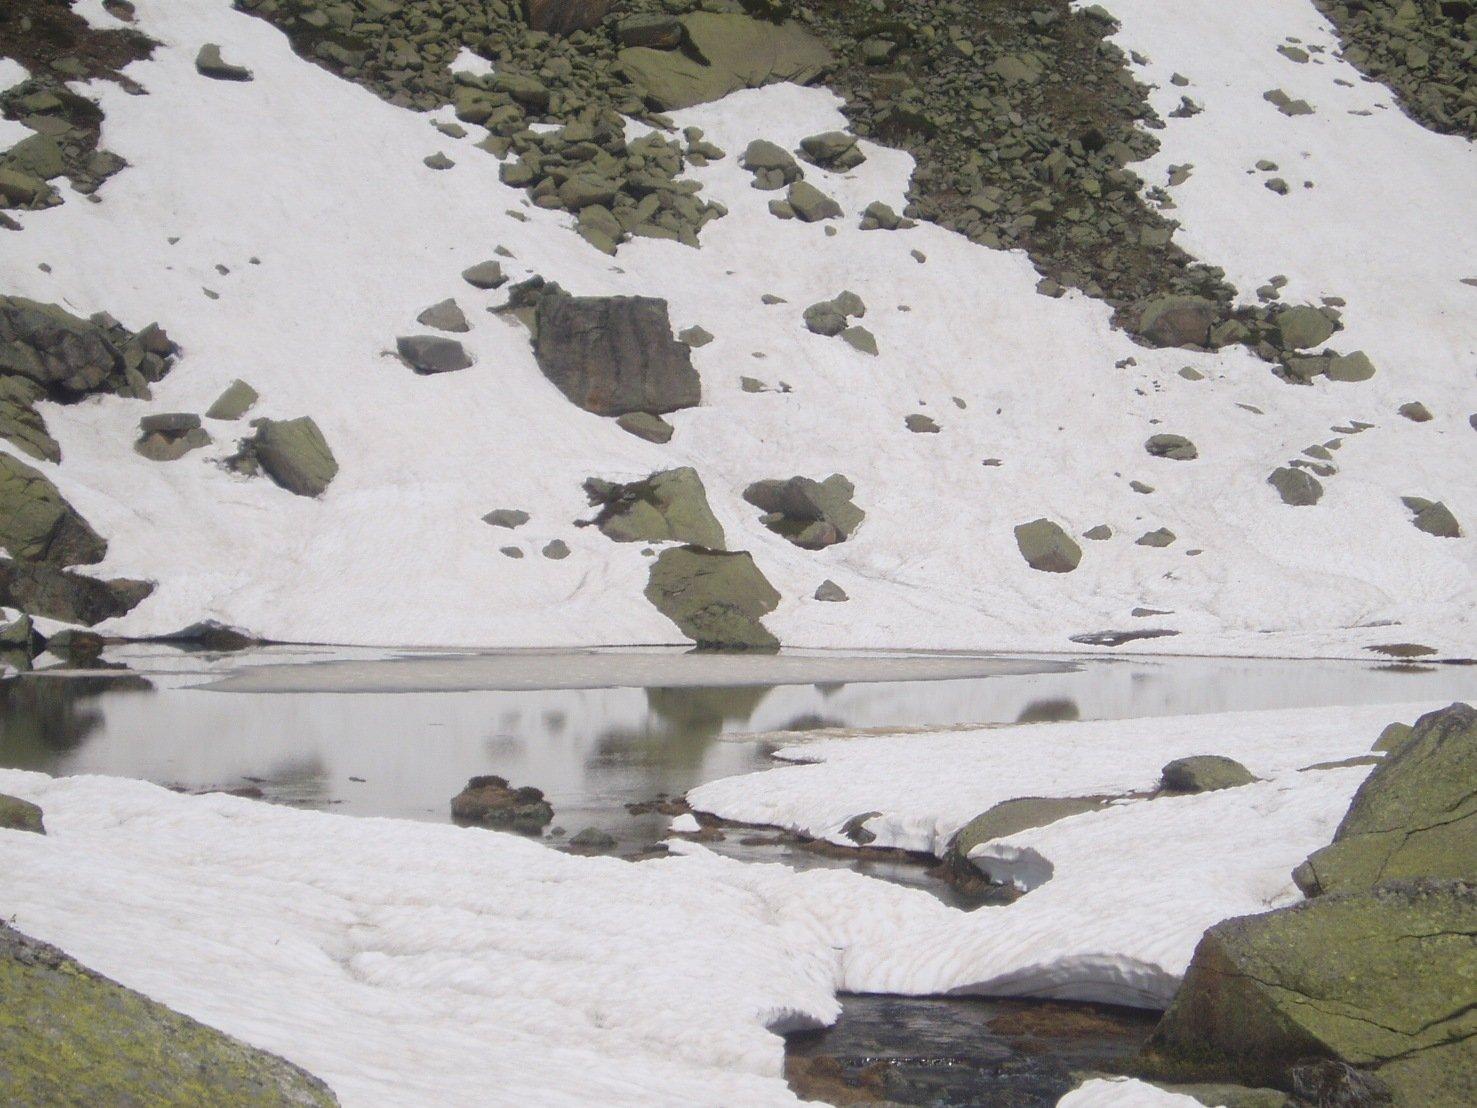 Lago superiore quasi libero dai ghiacci.